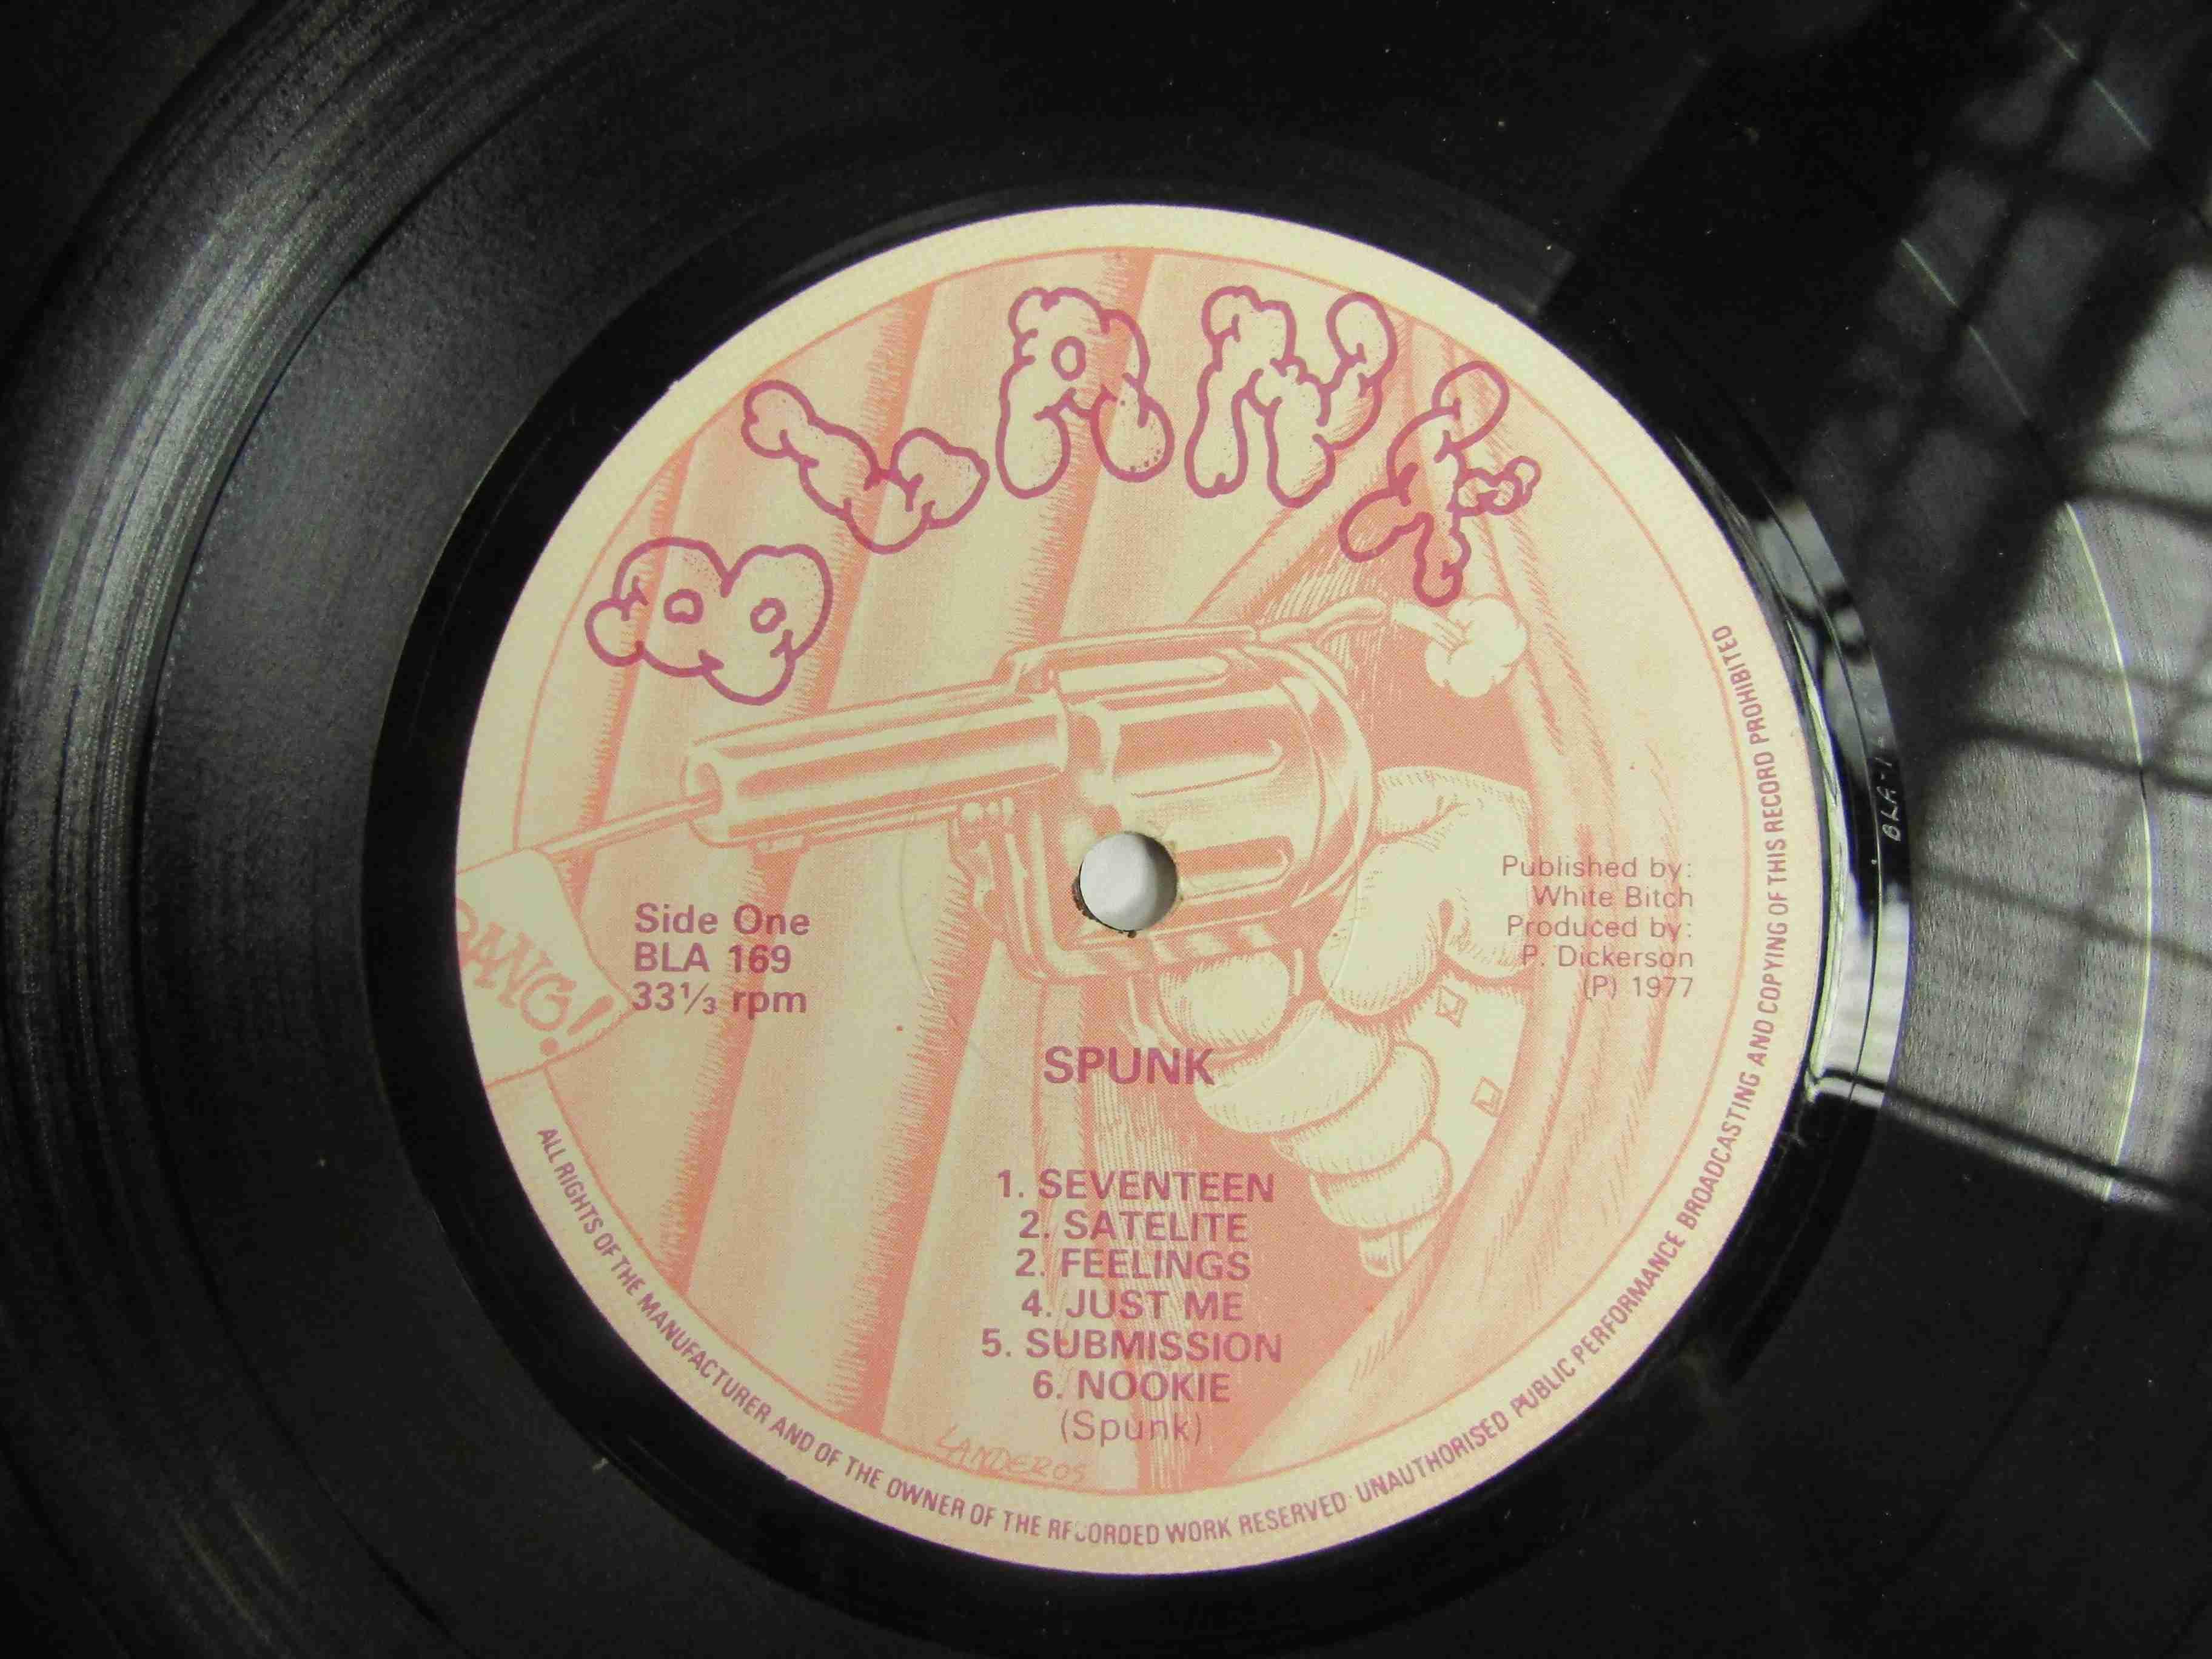 SEX PISTOLS: 'Spunk' LP, unnofficial, original 1977 pressing, - Image 2 of 2